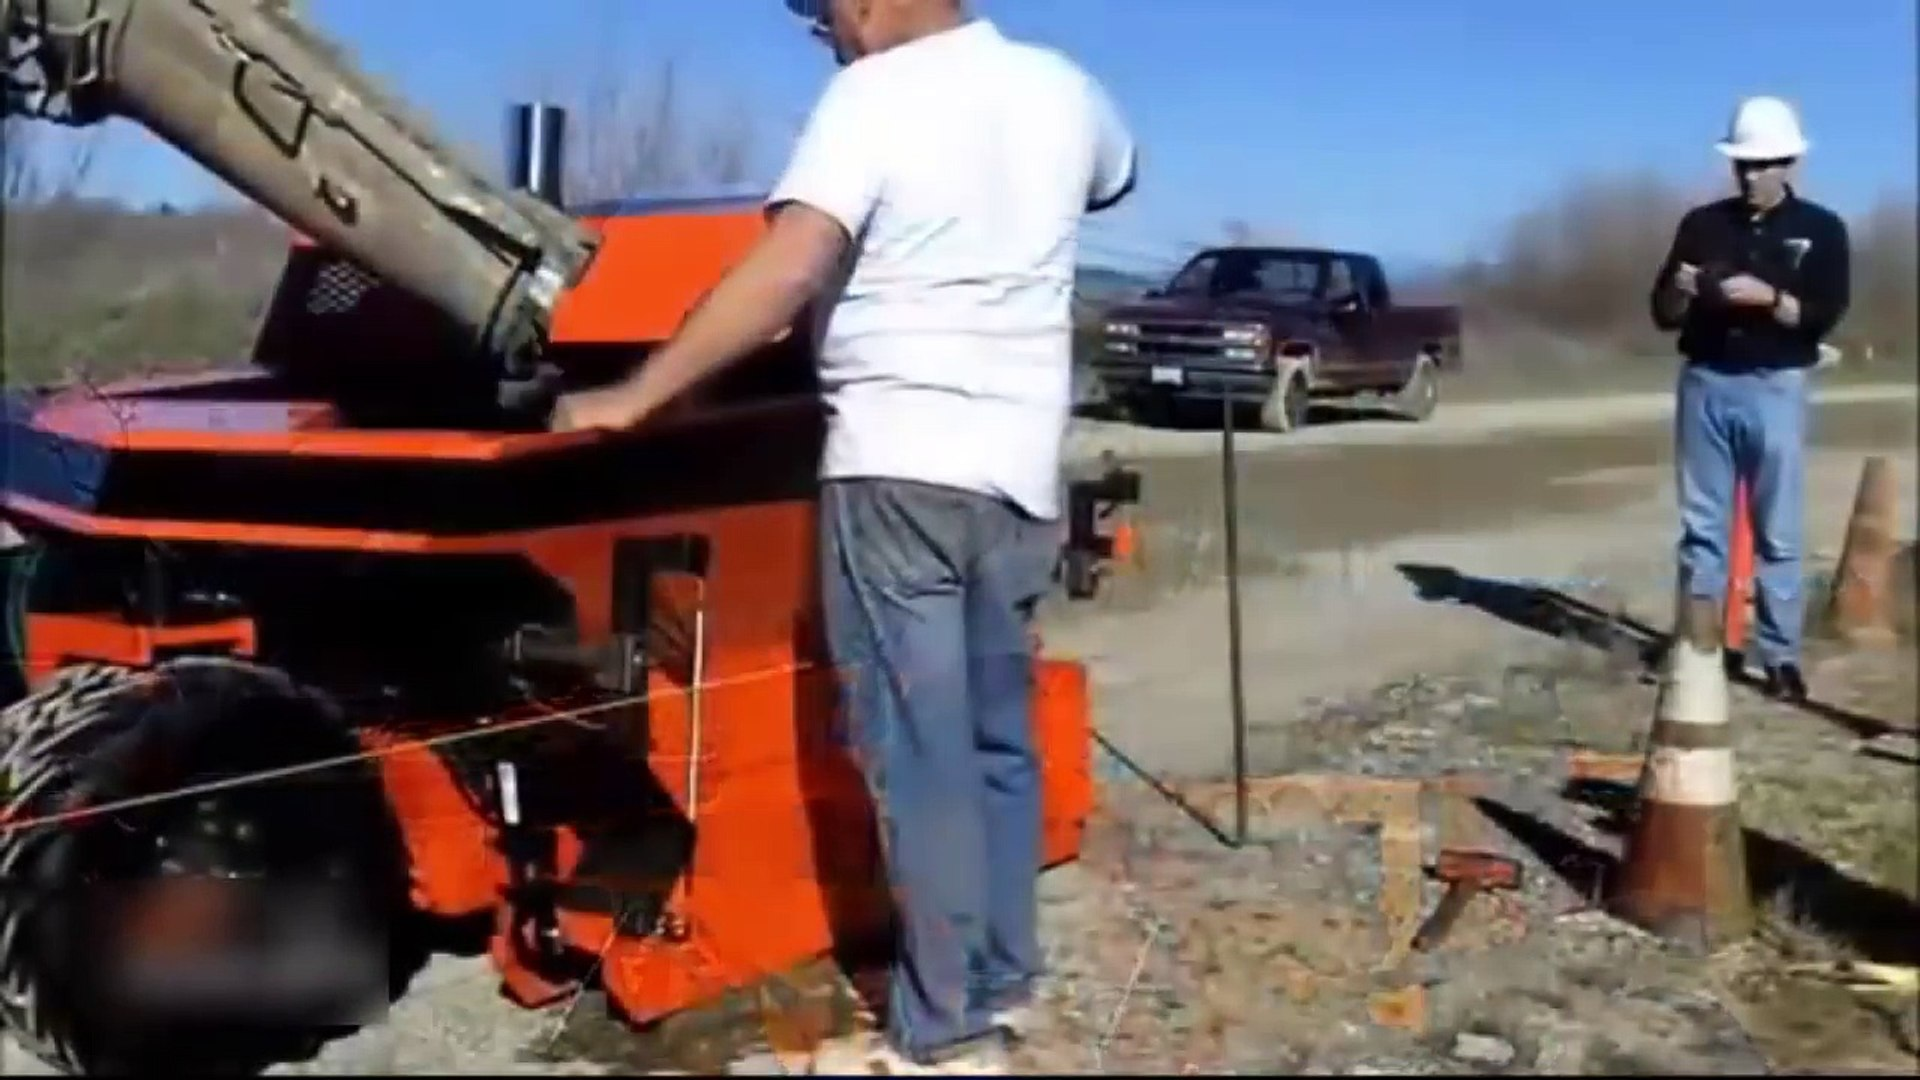 Latest Technology 2017 Mobile Concrete Slipform Curb Machine New Model-fOG9jomfOws